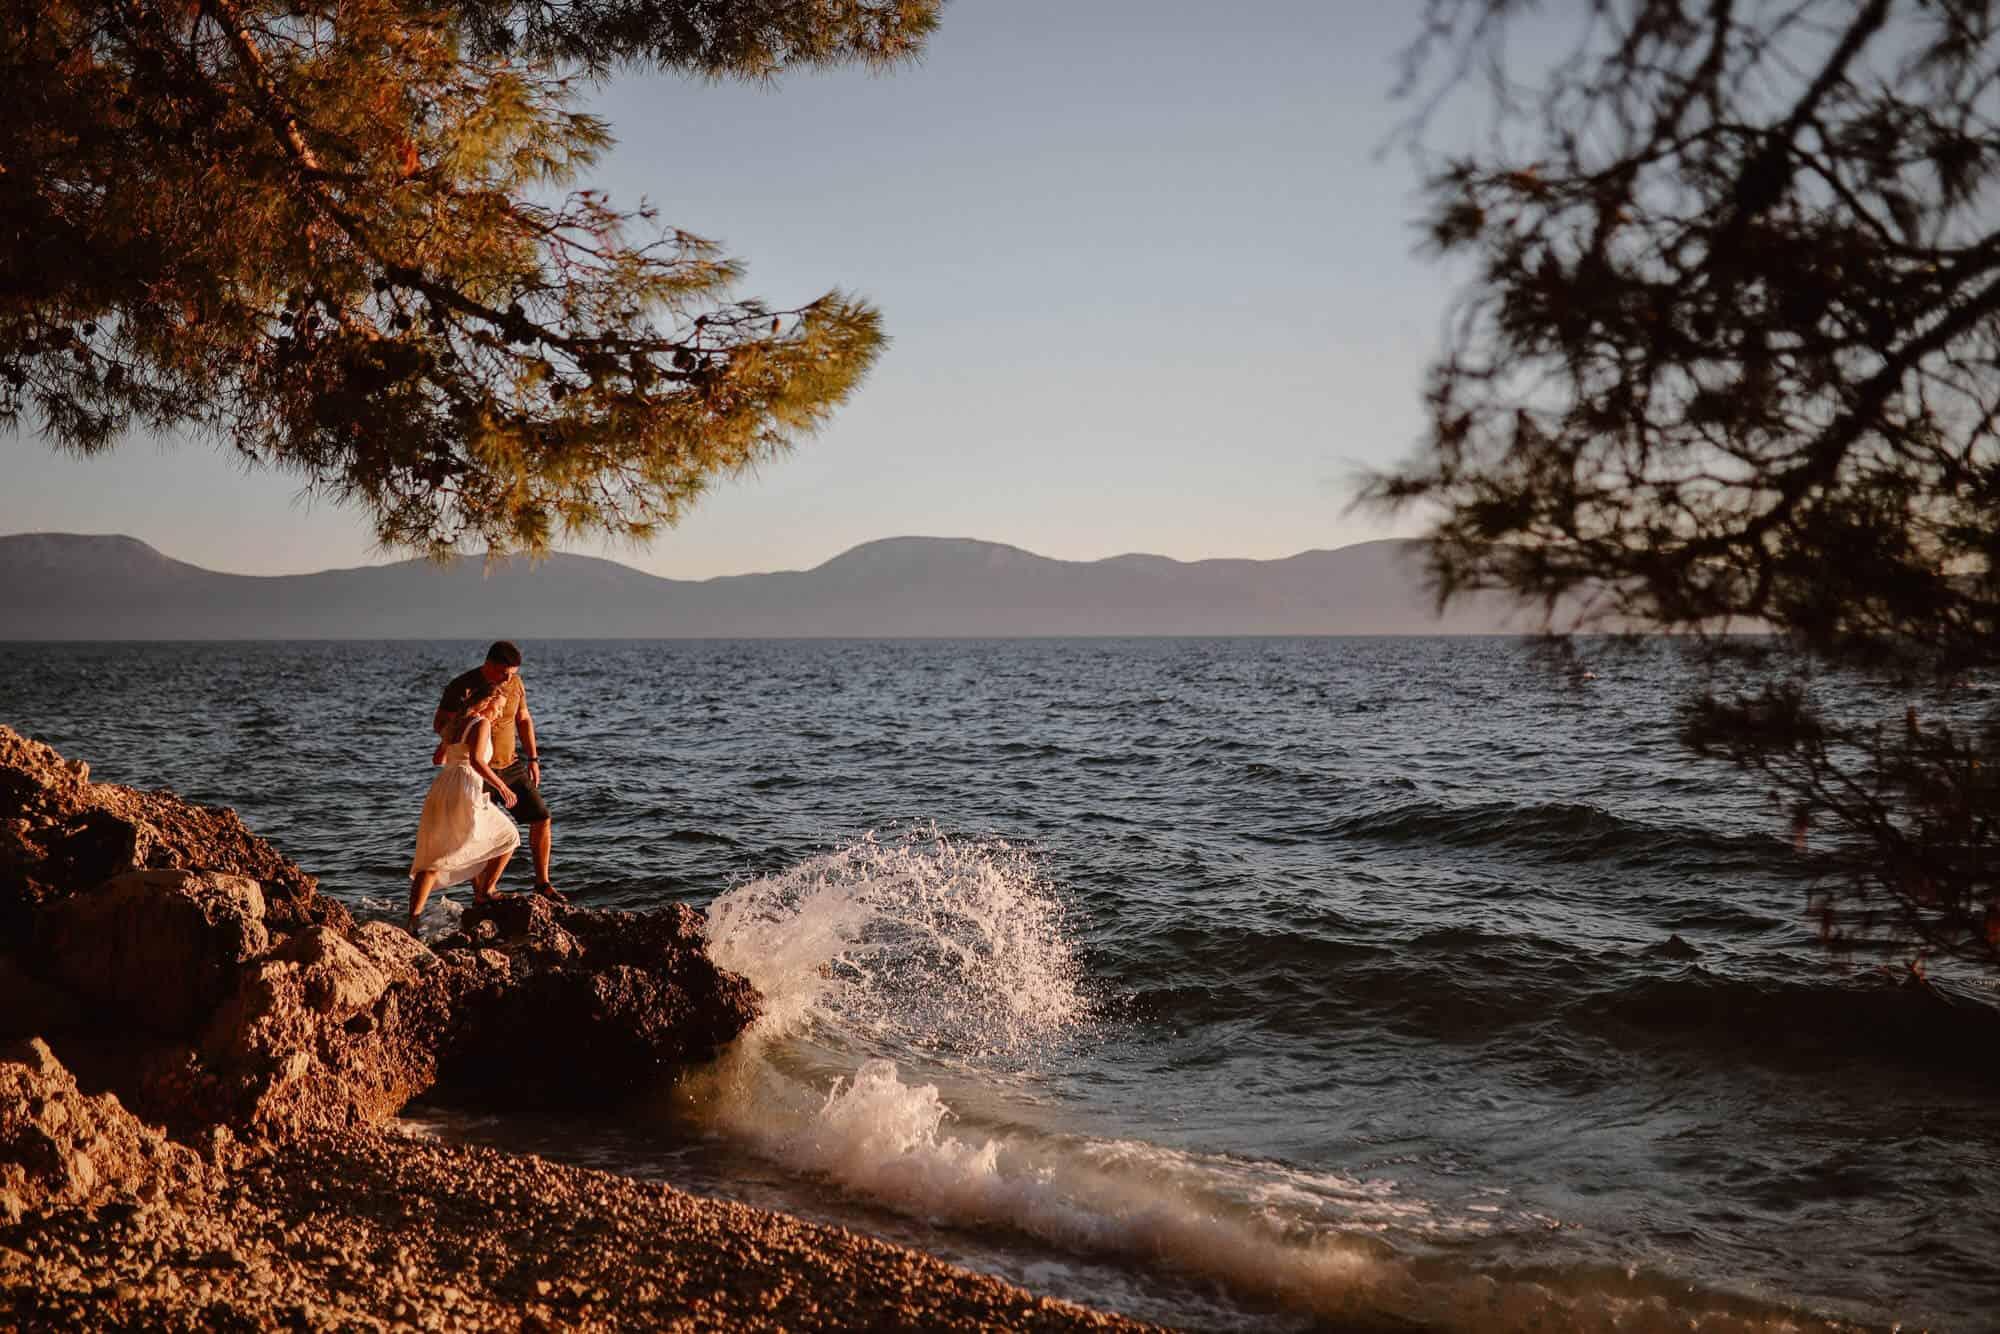 croatia holidays for couples